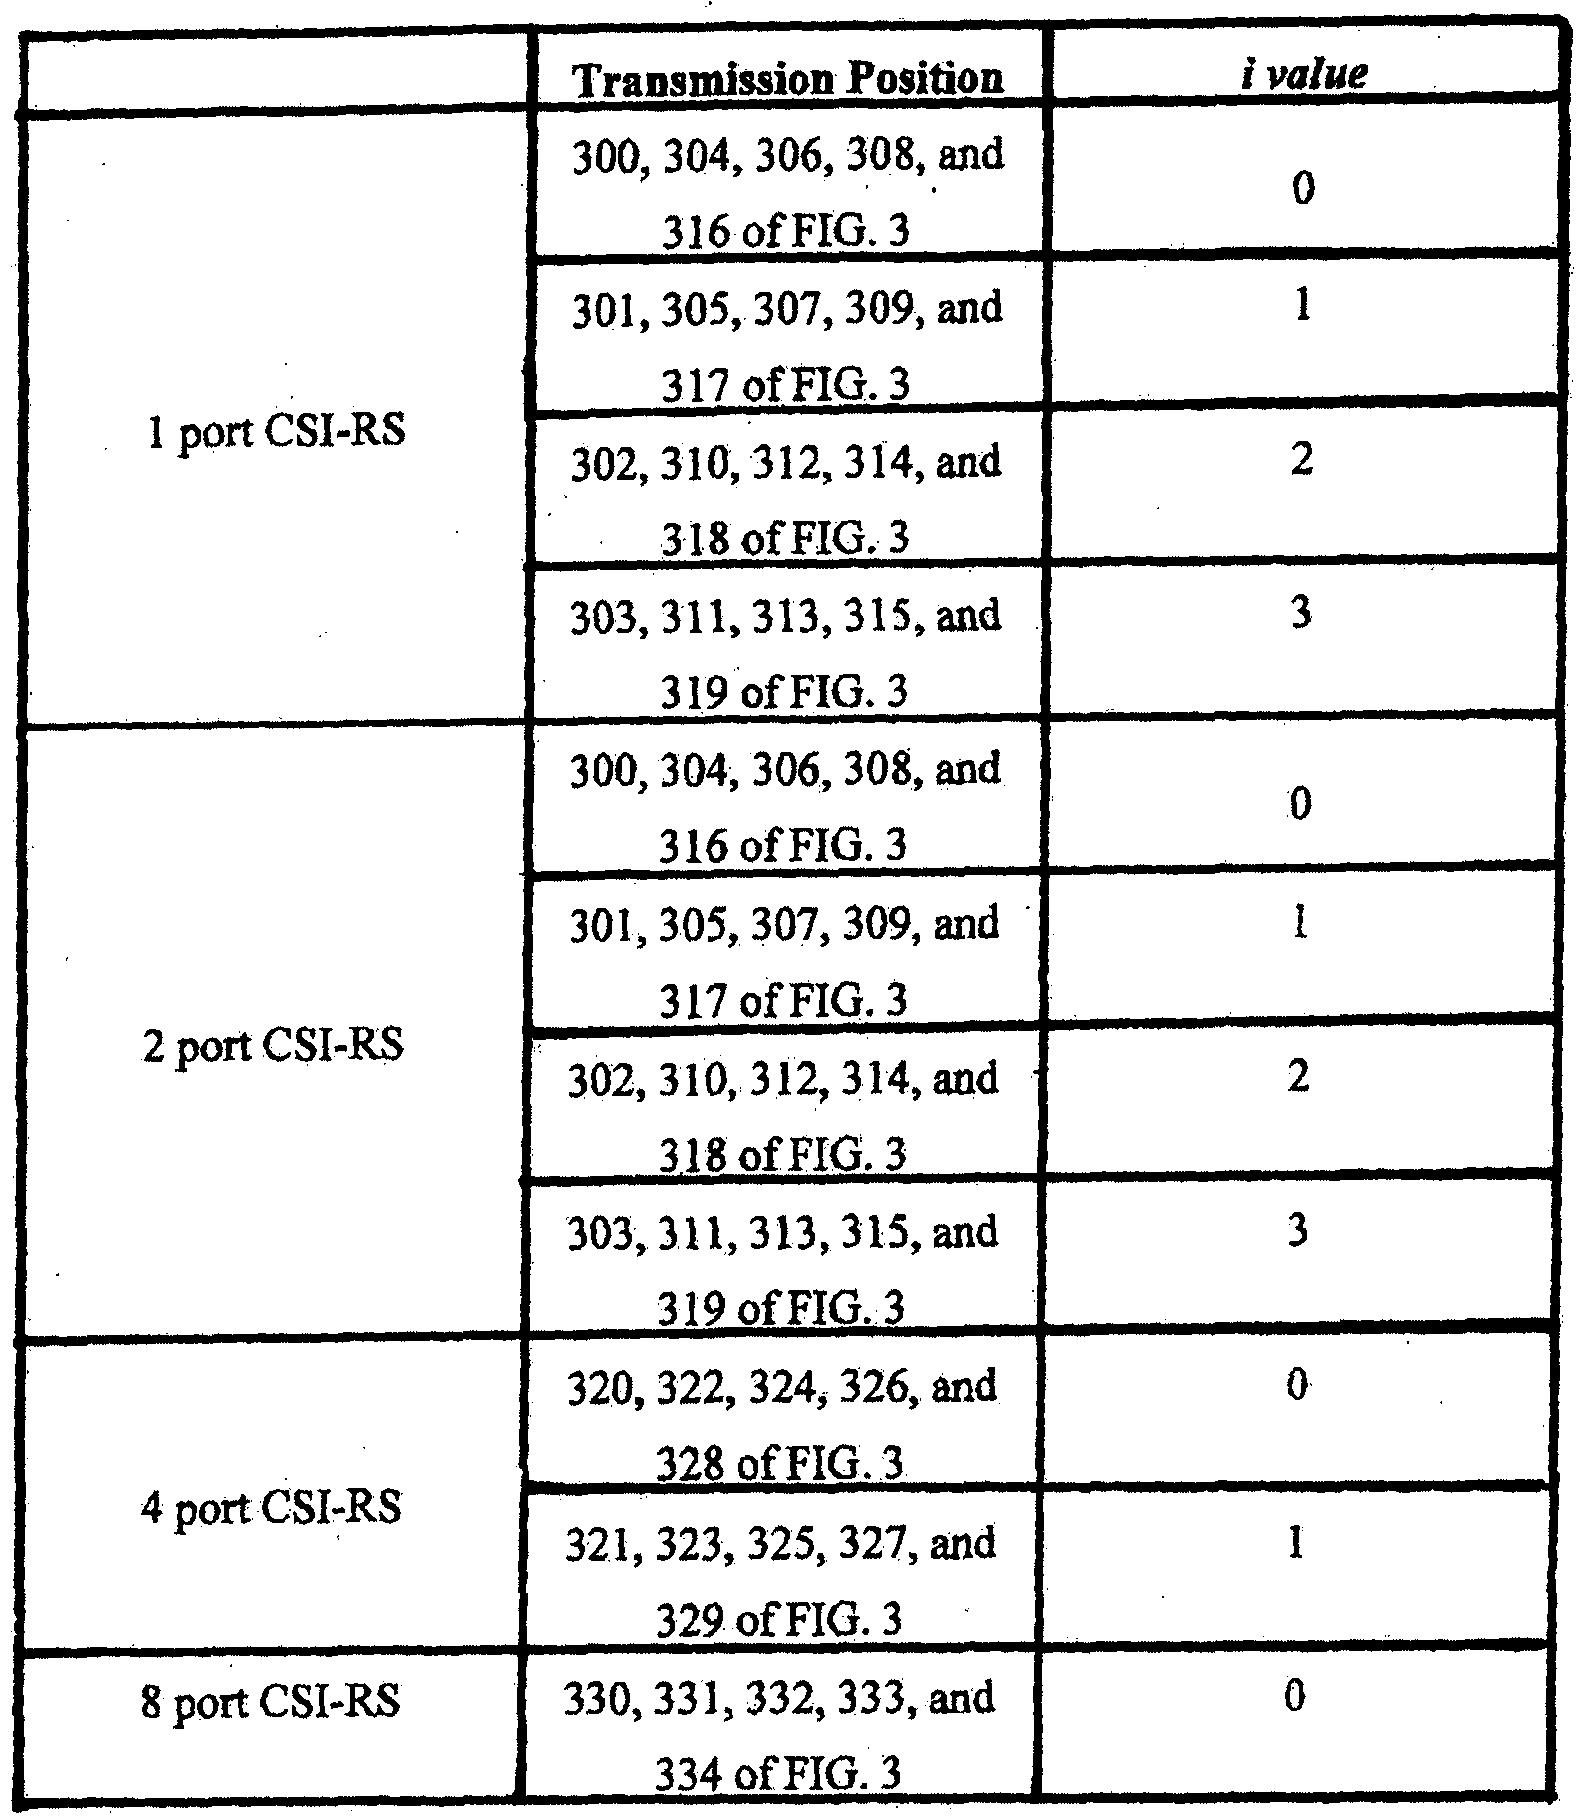 Figure WO-DOC-FIGURE-80